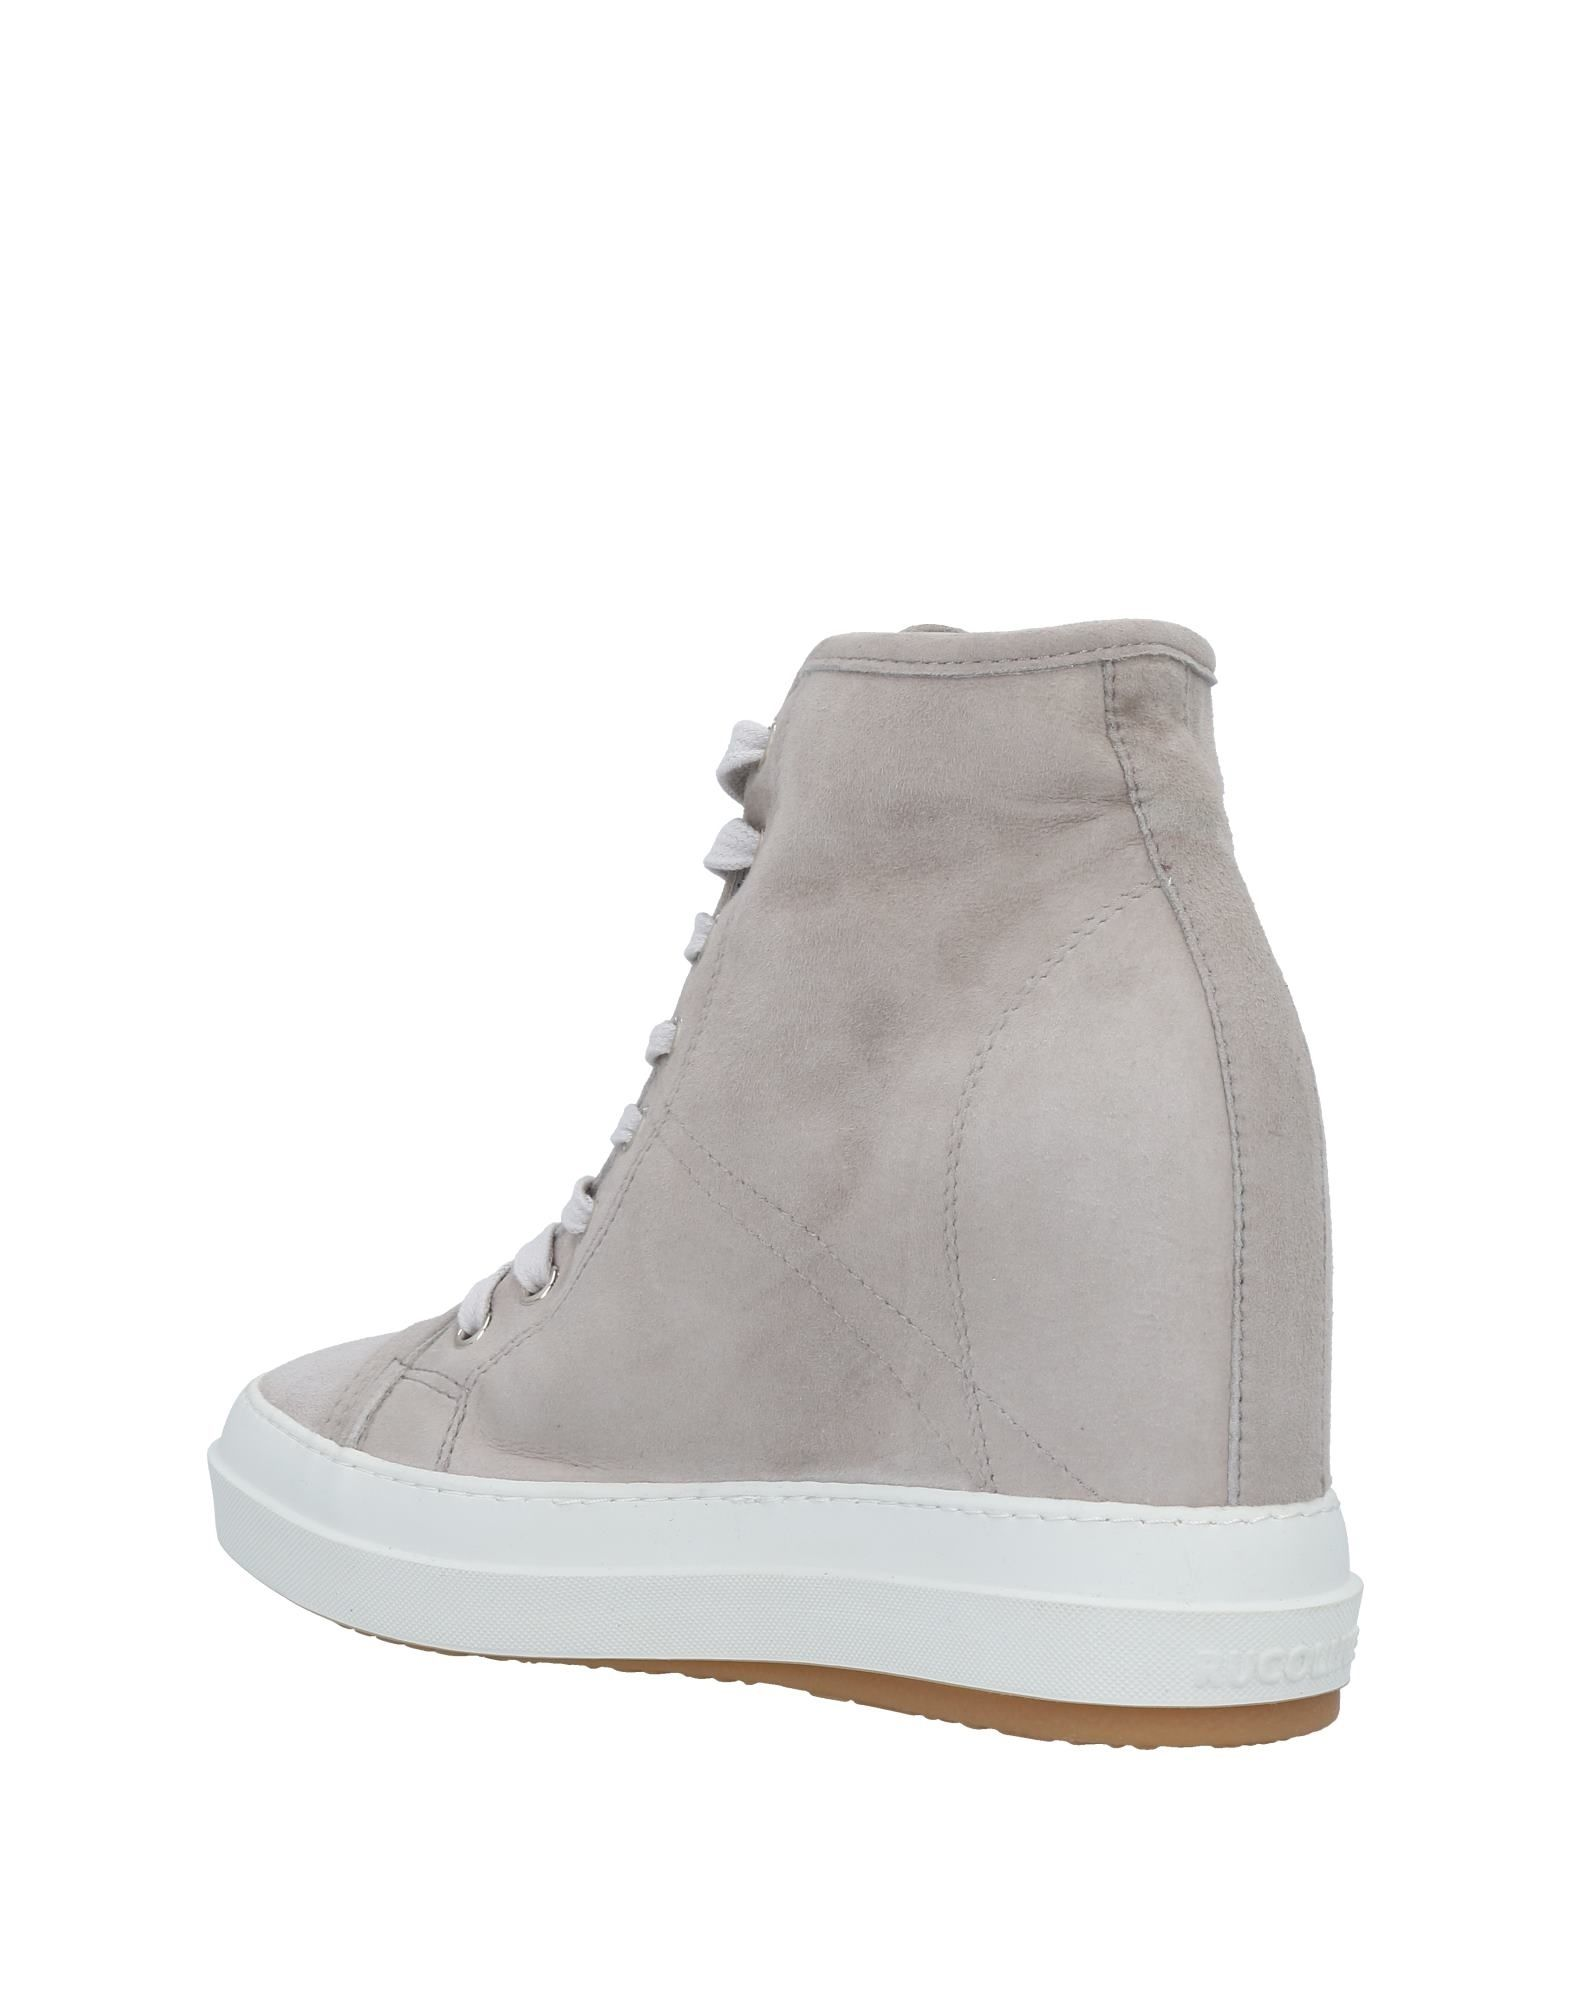 Ruco Ruco Ruco Line Sneakers Damen Gutes Preis-Leistungs-Verhältnis, es lohnt sich cca1ed